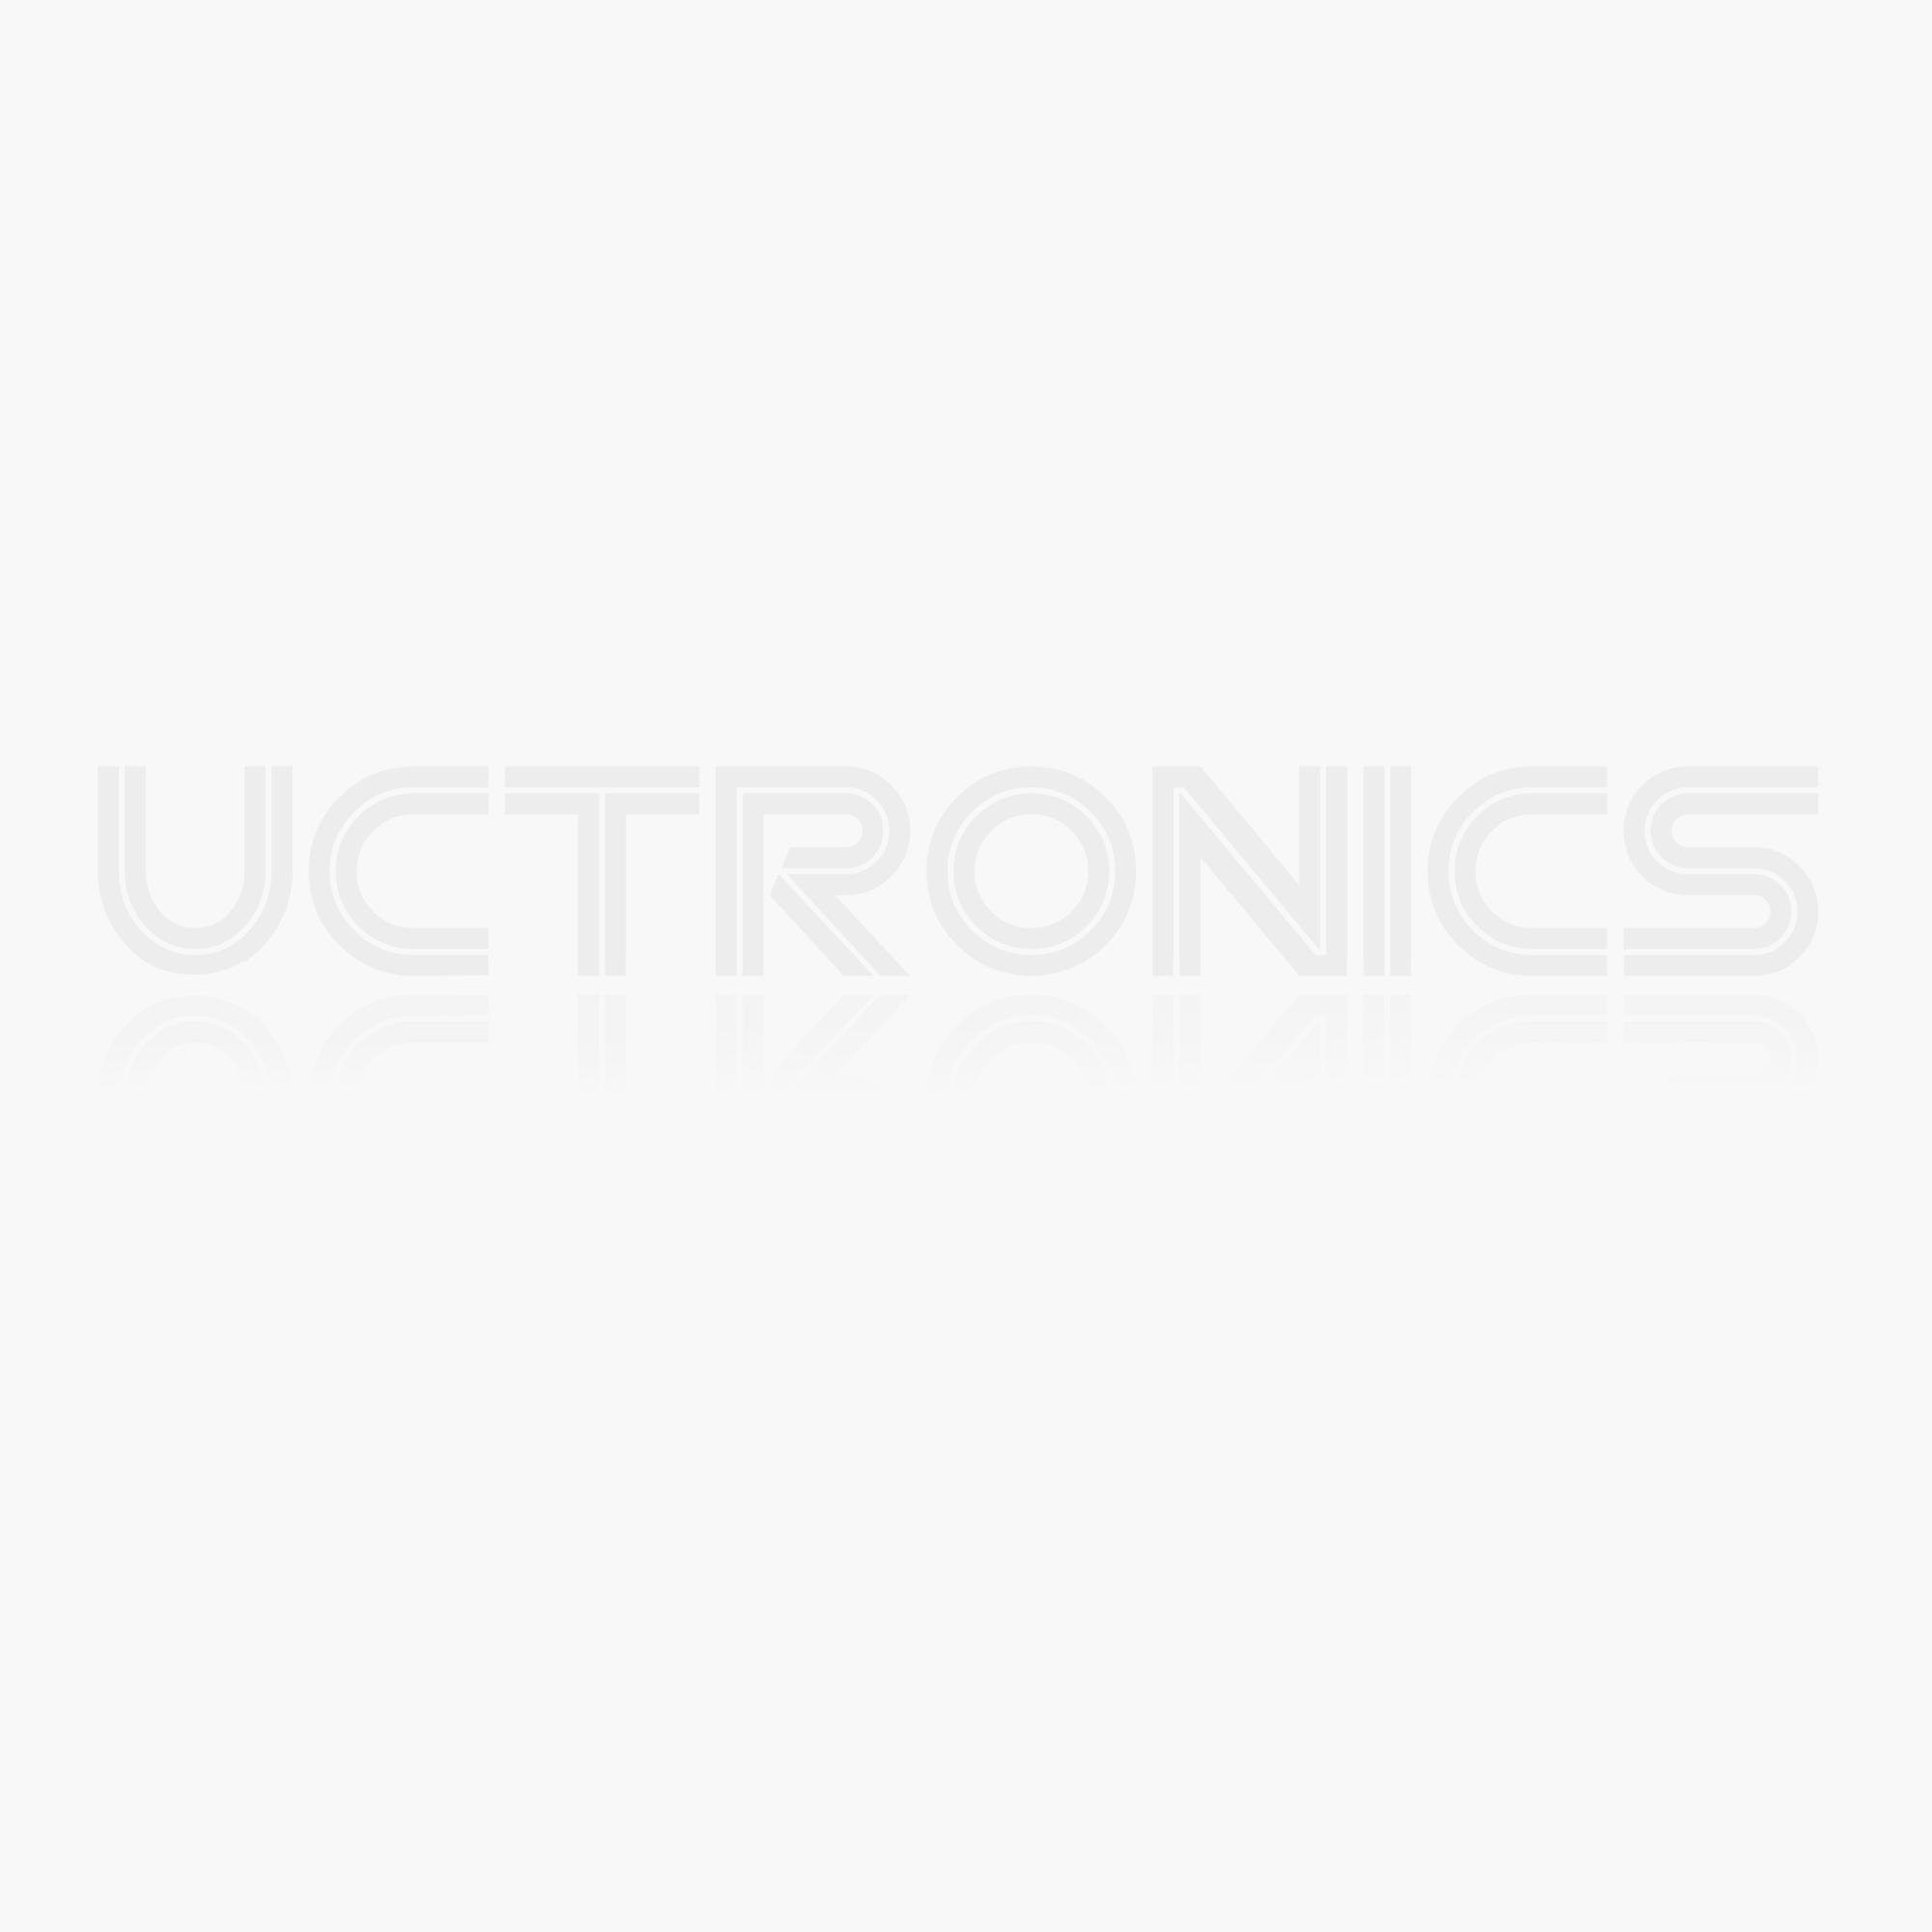 16 Channel Analog High-Speed CMOS MUX Multiplexer CD74HC4067 for Arduino